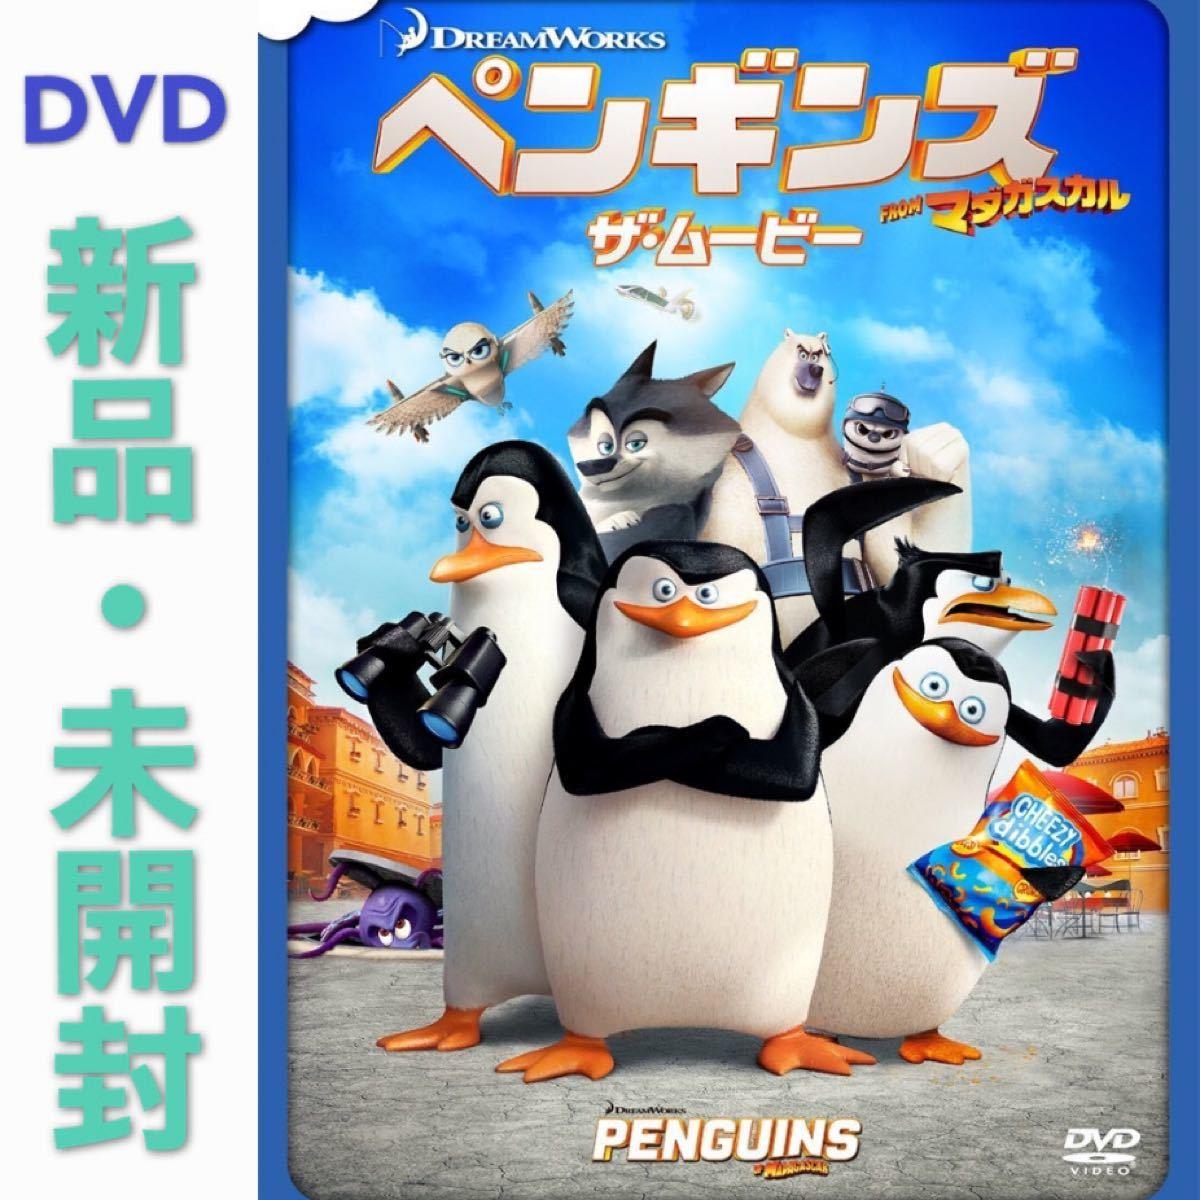 DVD ペンギンズ FROM マダガスカル ザ・ムービー 新品・未開封